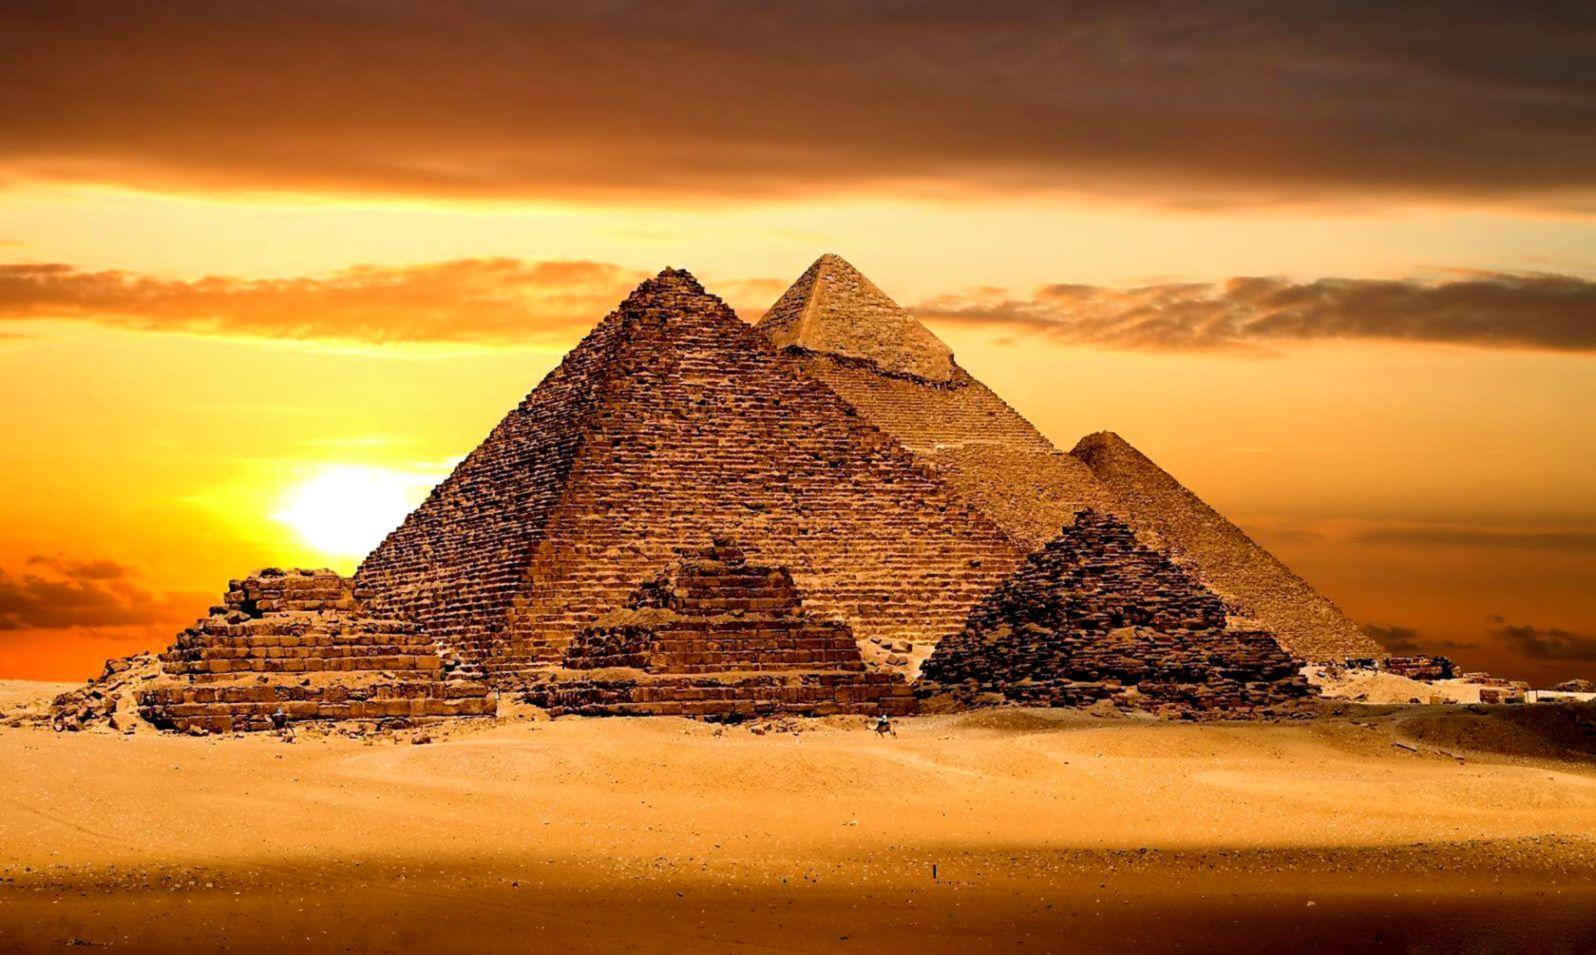 Piramid Beautiful Place Wallpaper | Wallpapers Mobile